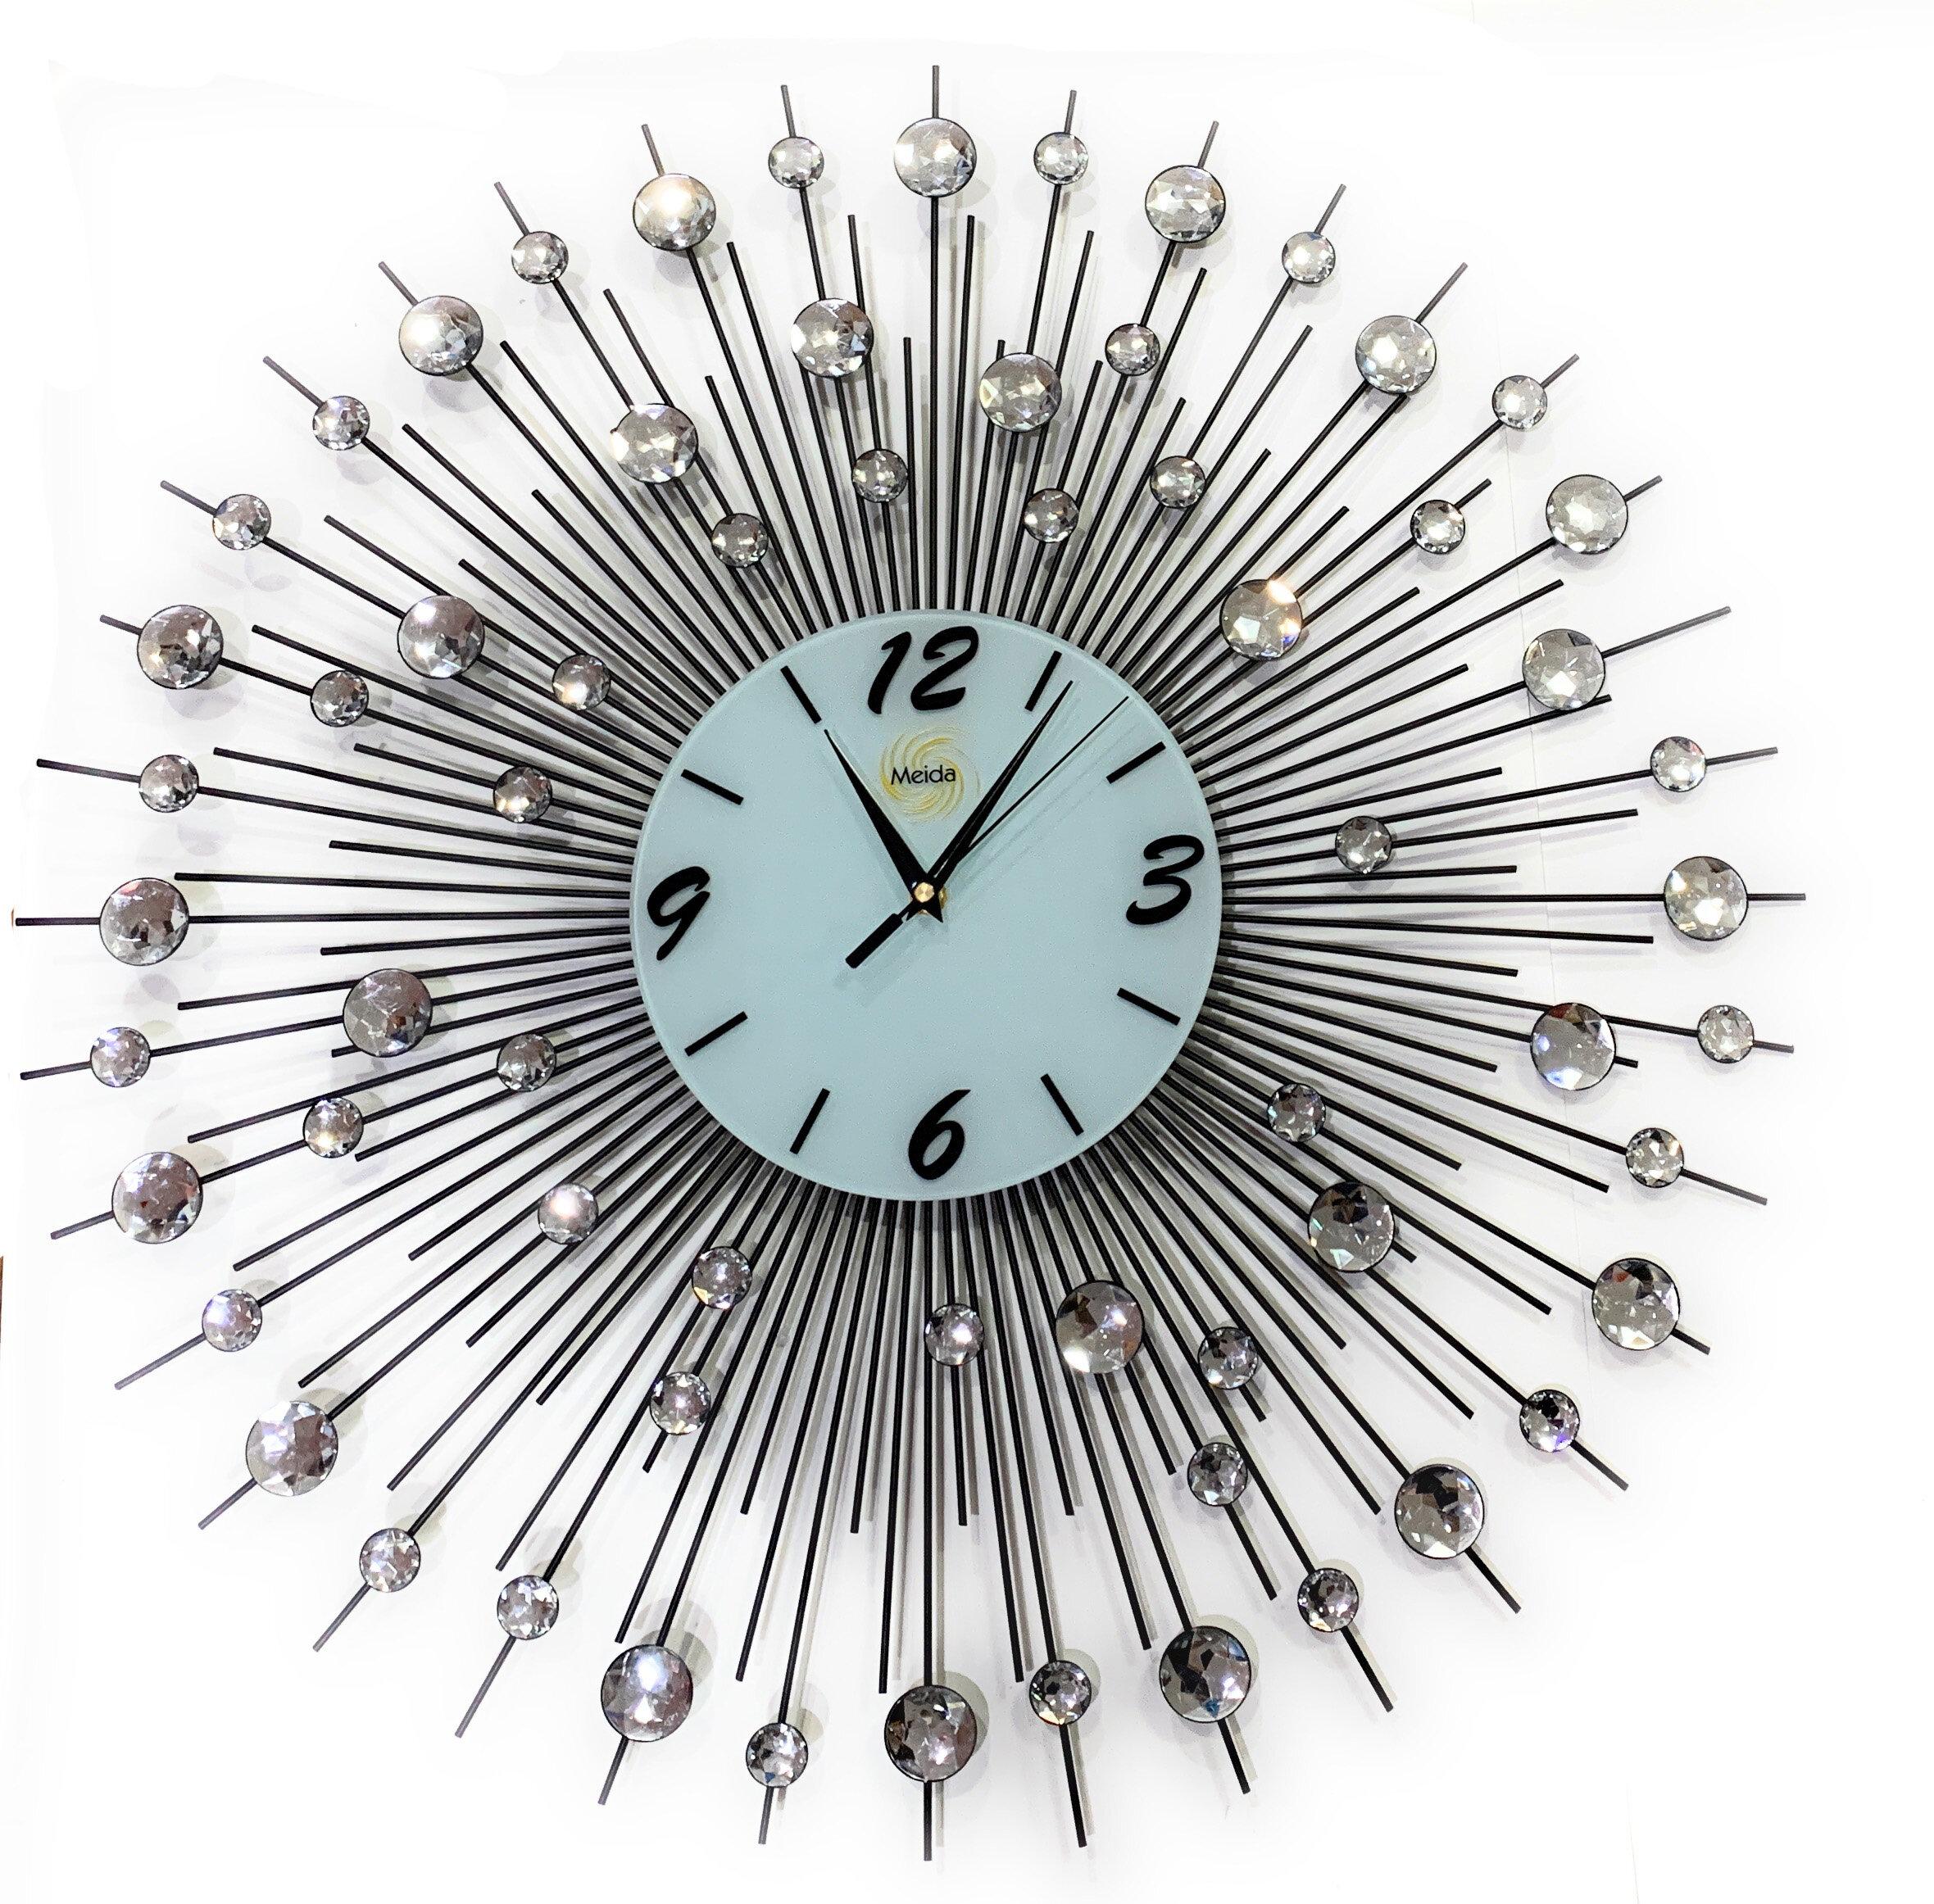 Meida Oversized 9 Wall Clock Reviews Wayfair